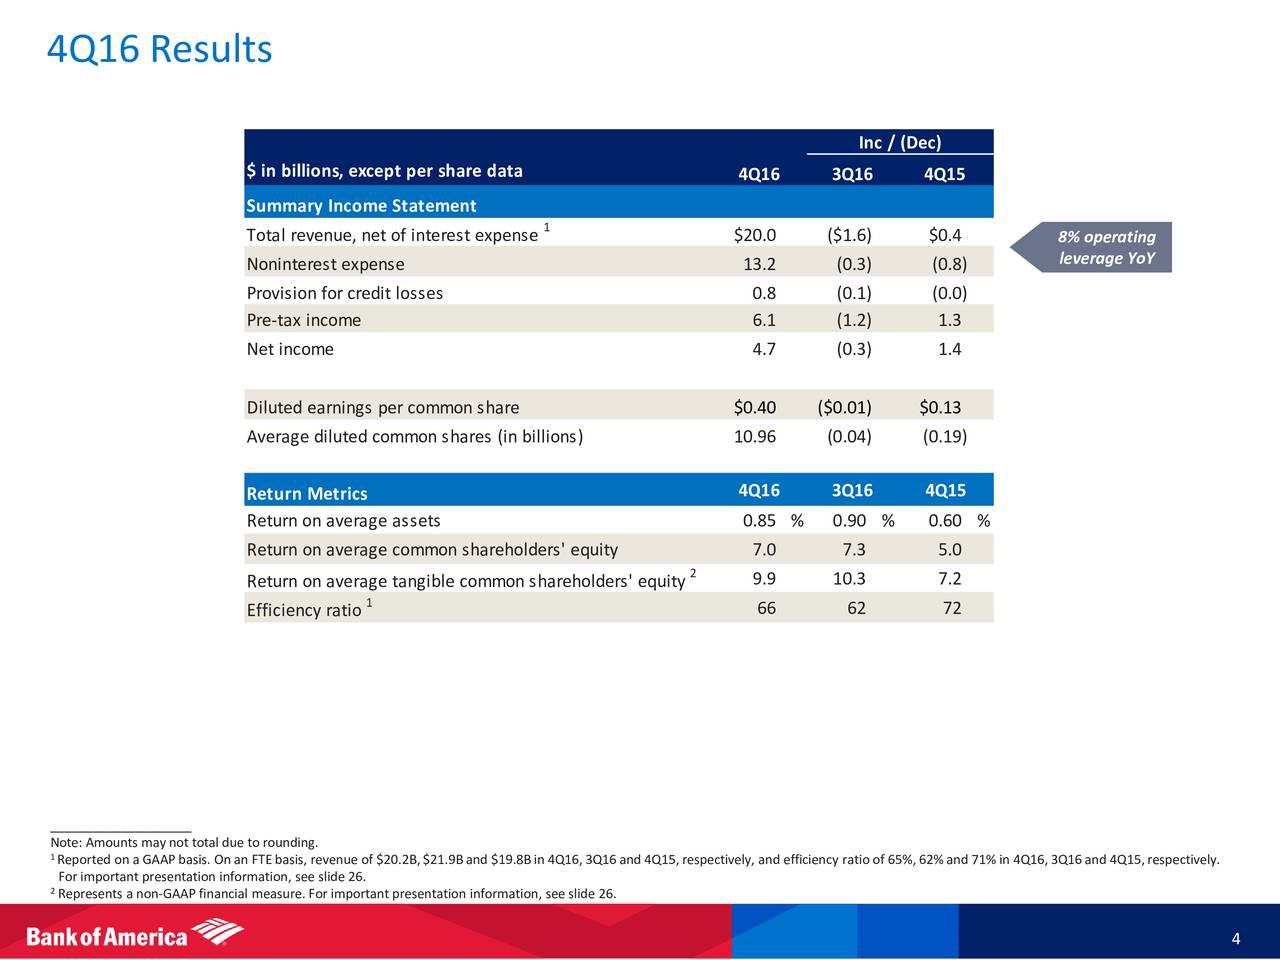 Earnings Disclaimer >> Bank of America Corporation 2016 Q4 - Results - Earnings Call Slides - Bank of America ...